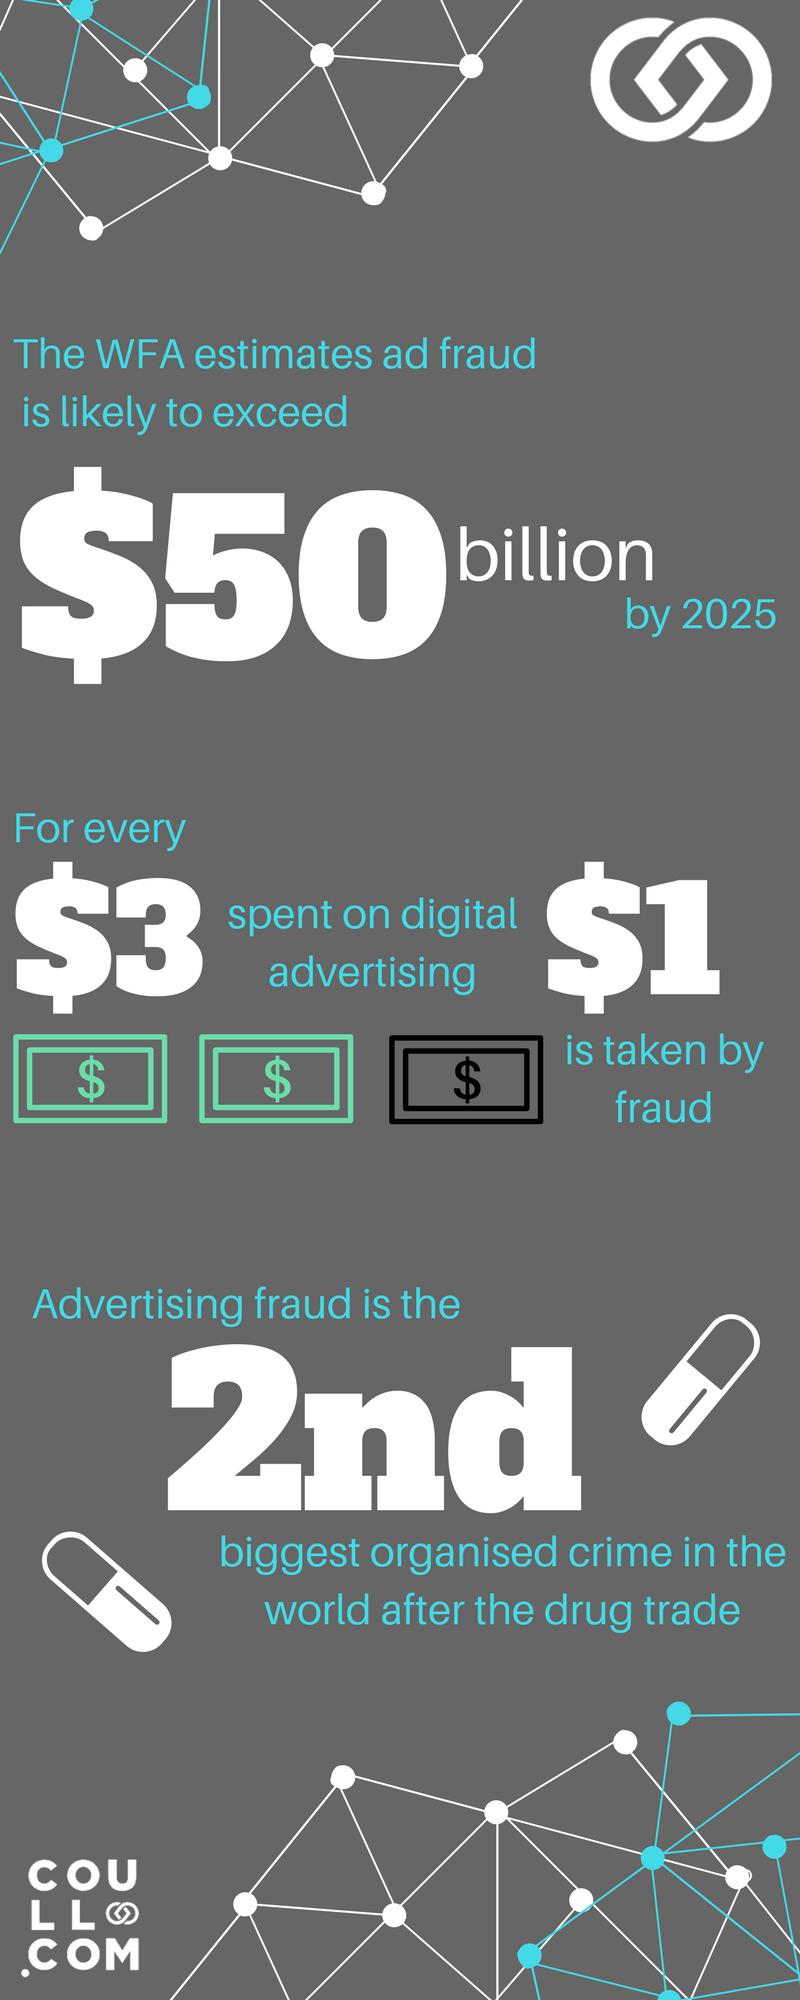 ad fraud infographic